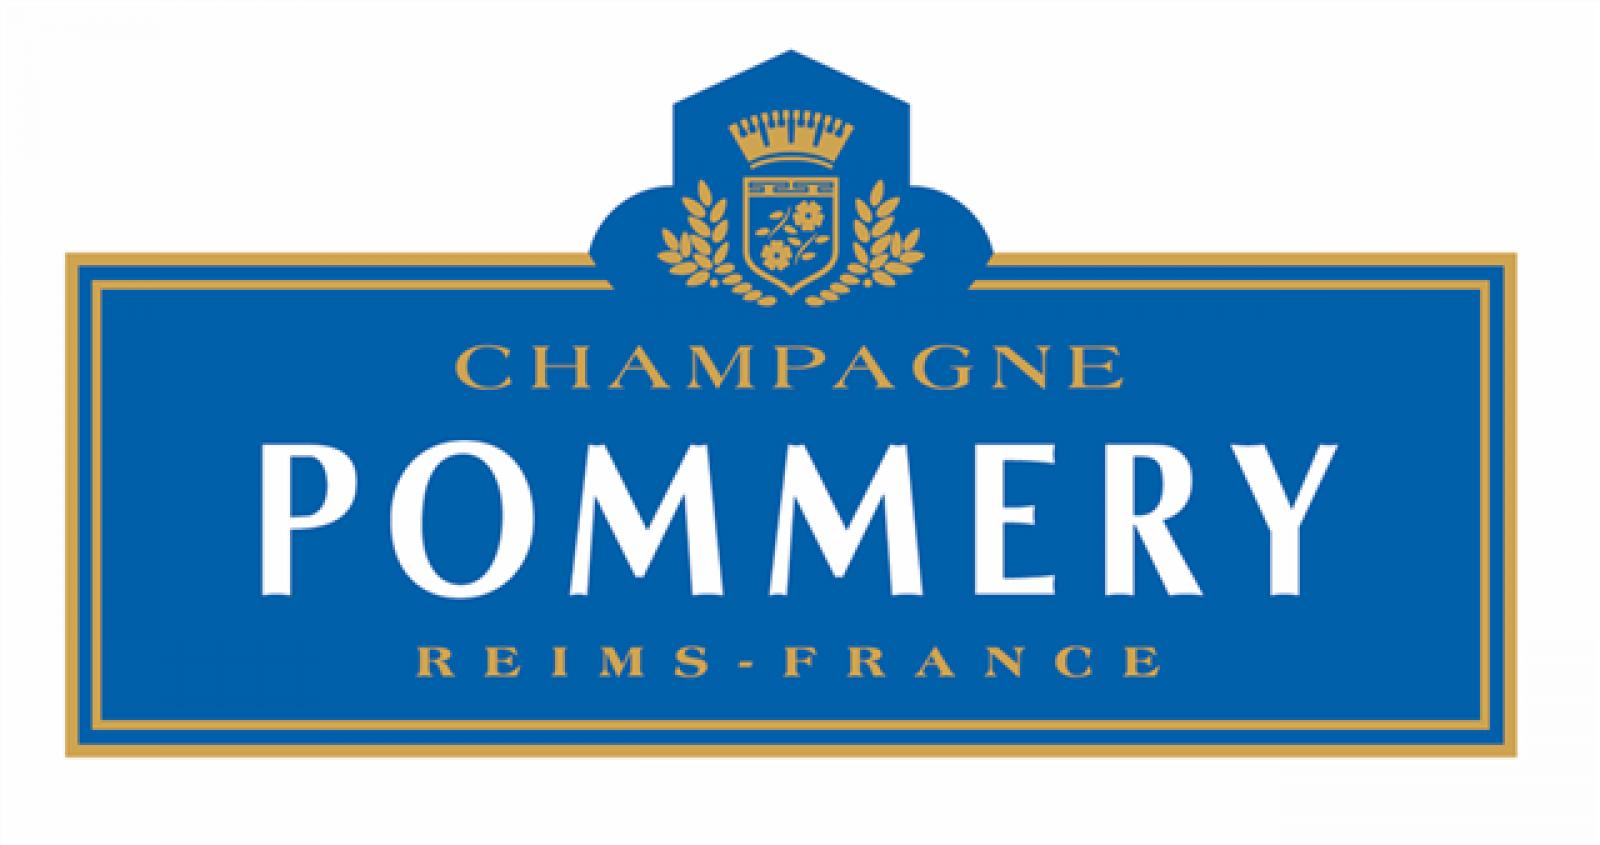 SRO Motorsports Group starts partnership with Vranken-Pommery